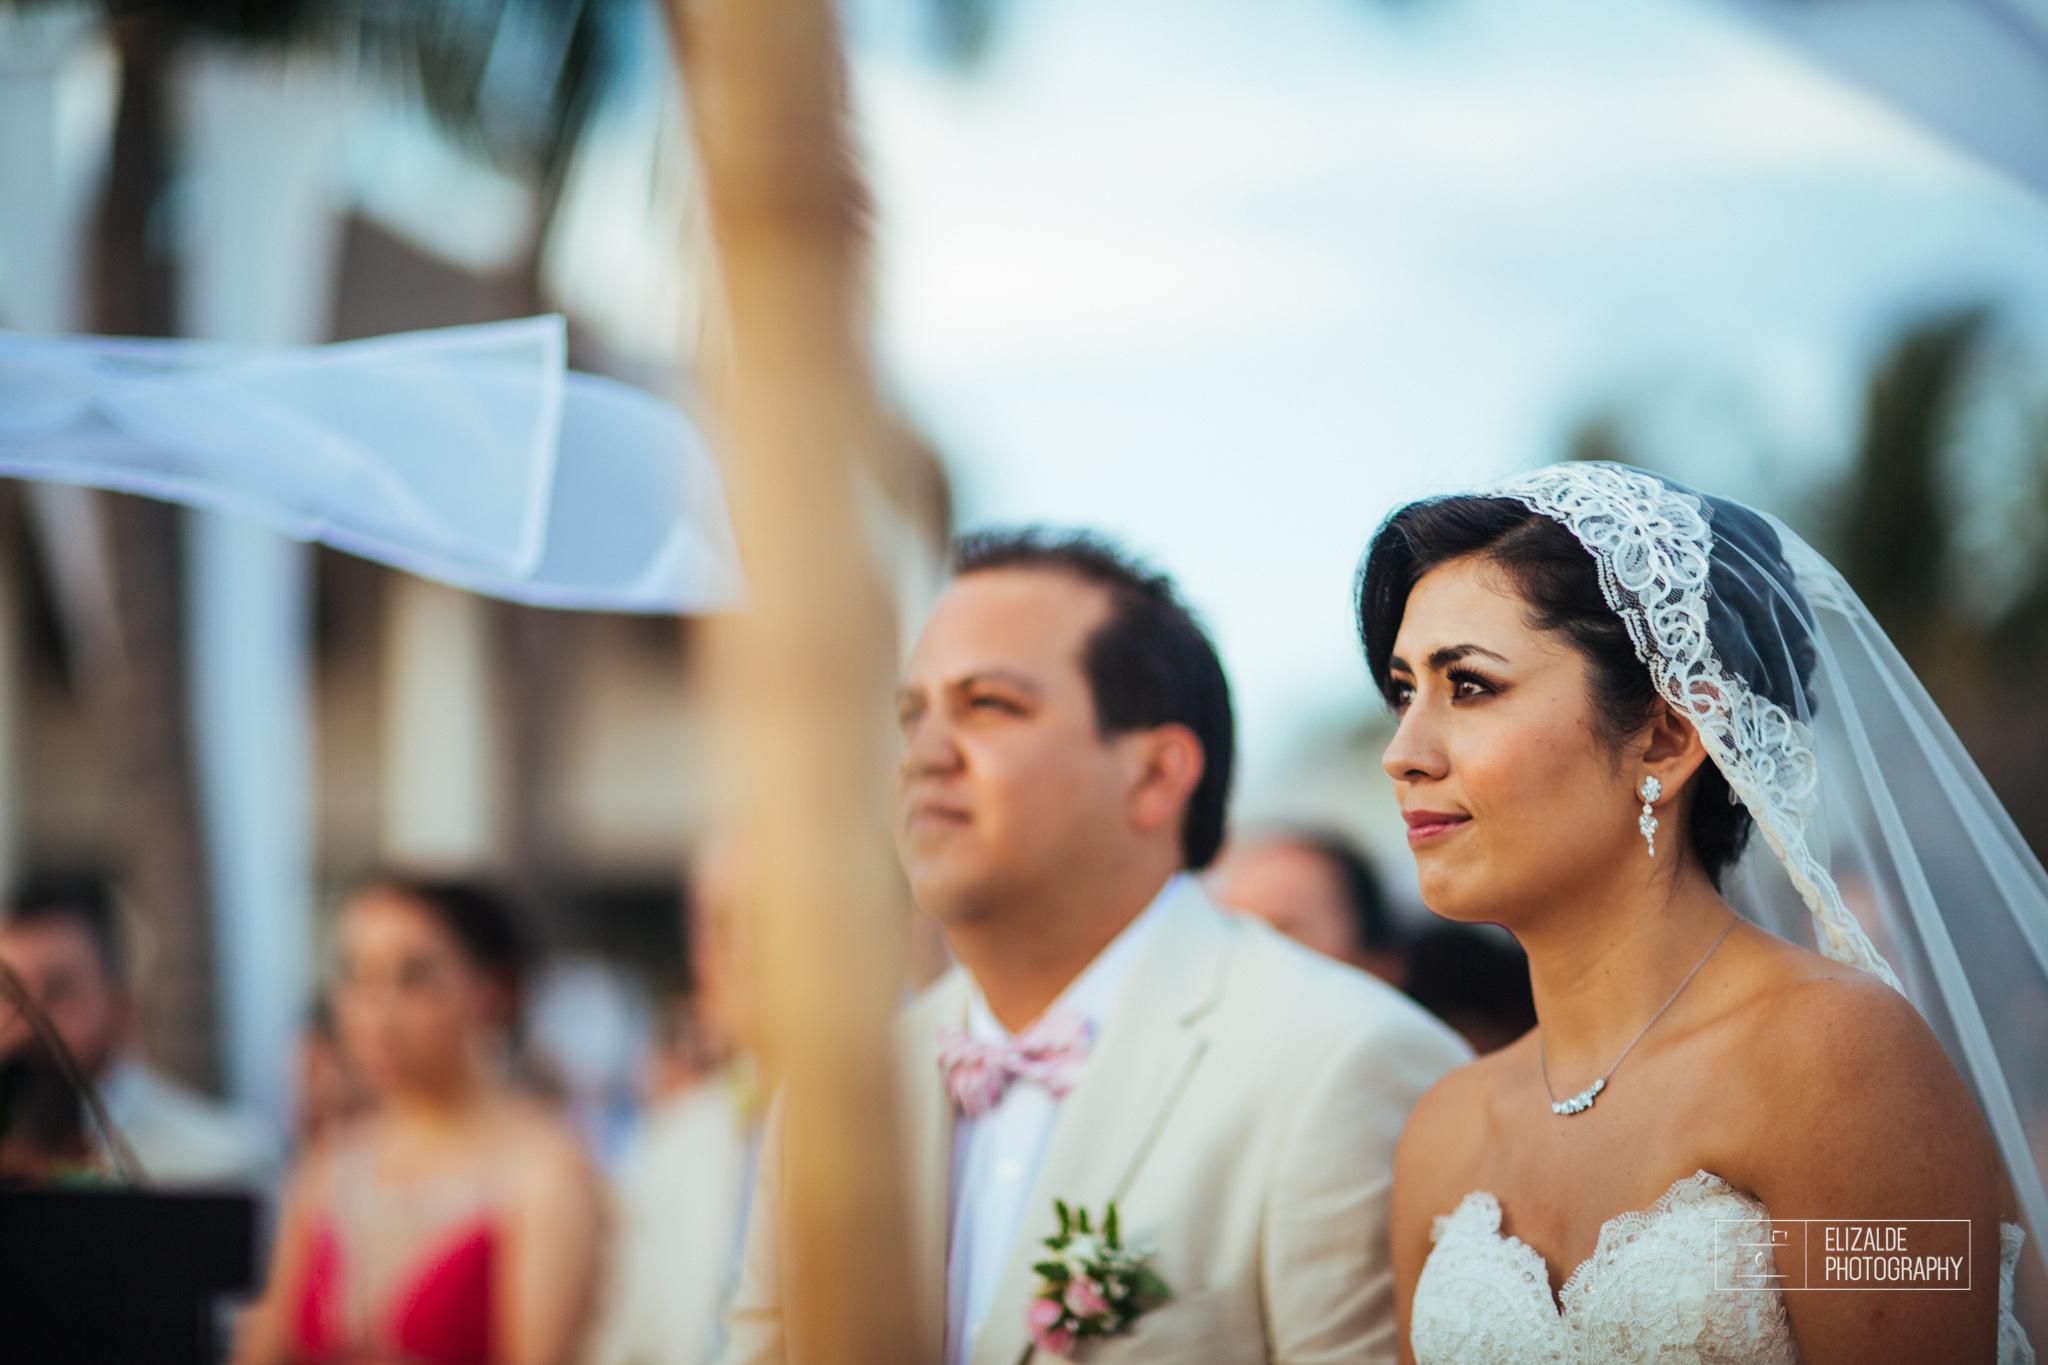 Pay and Ferran_Acapulco_Destination Wedding_Elizalde Photography-92.jpg